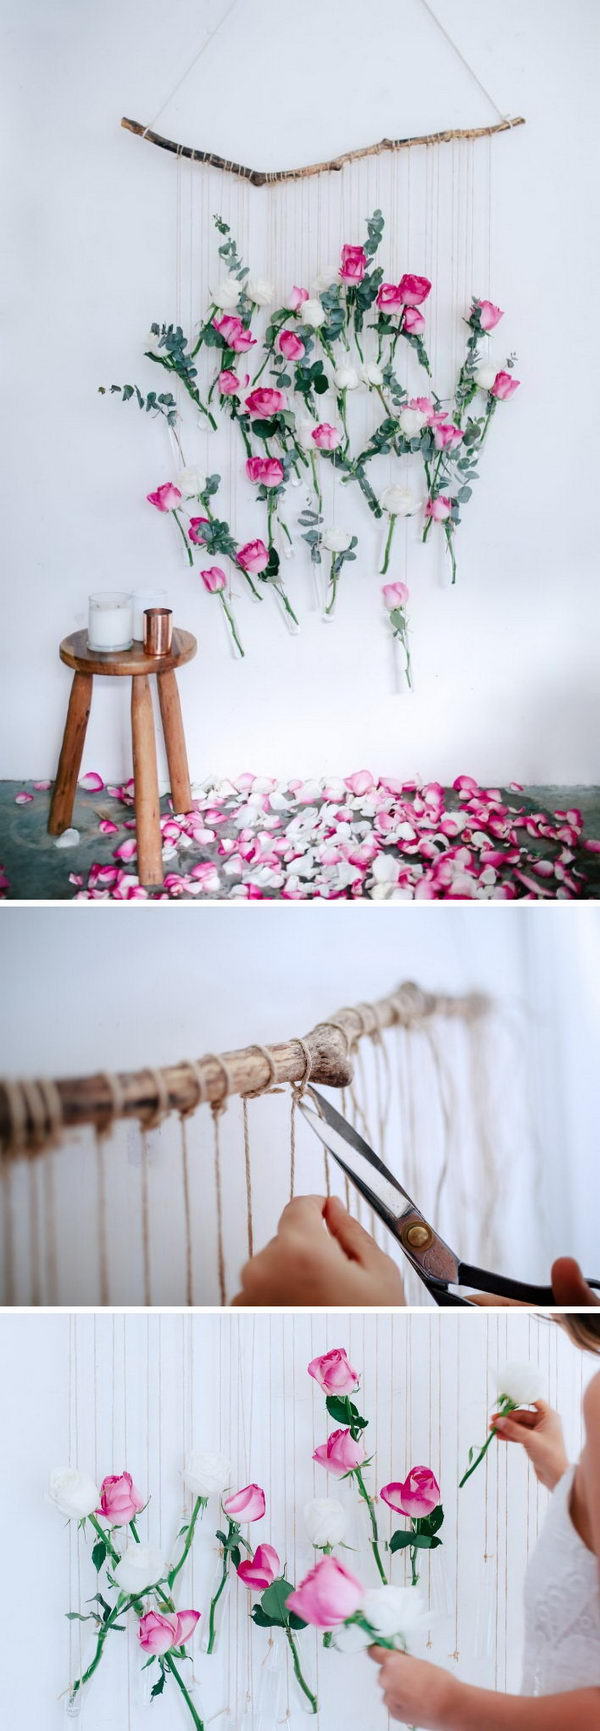 DIY Floral Vase Wall Hanging .